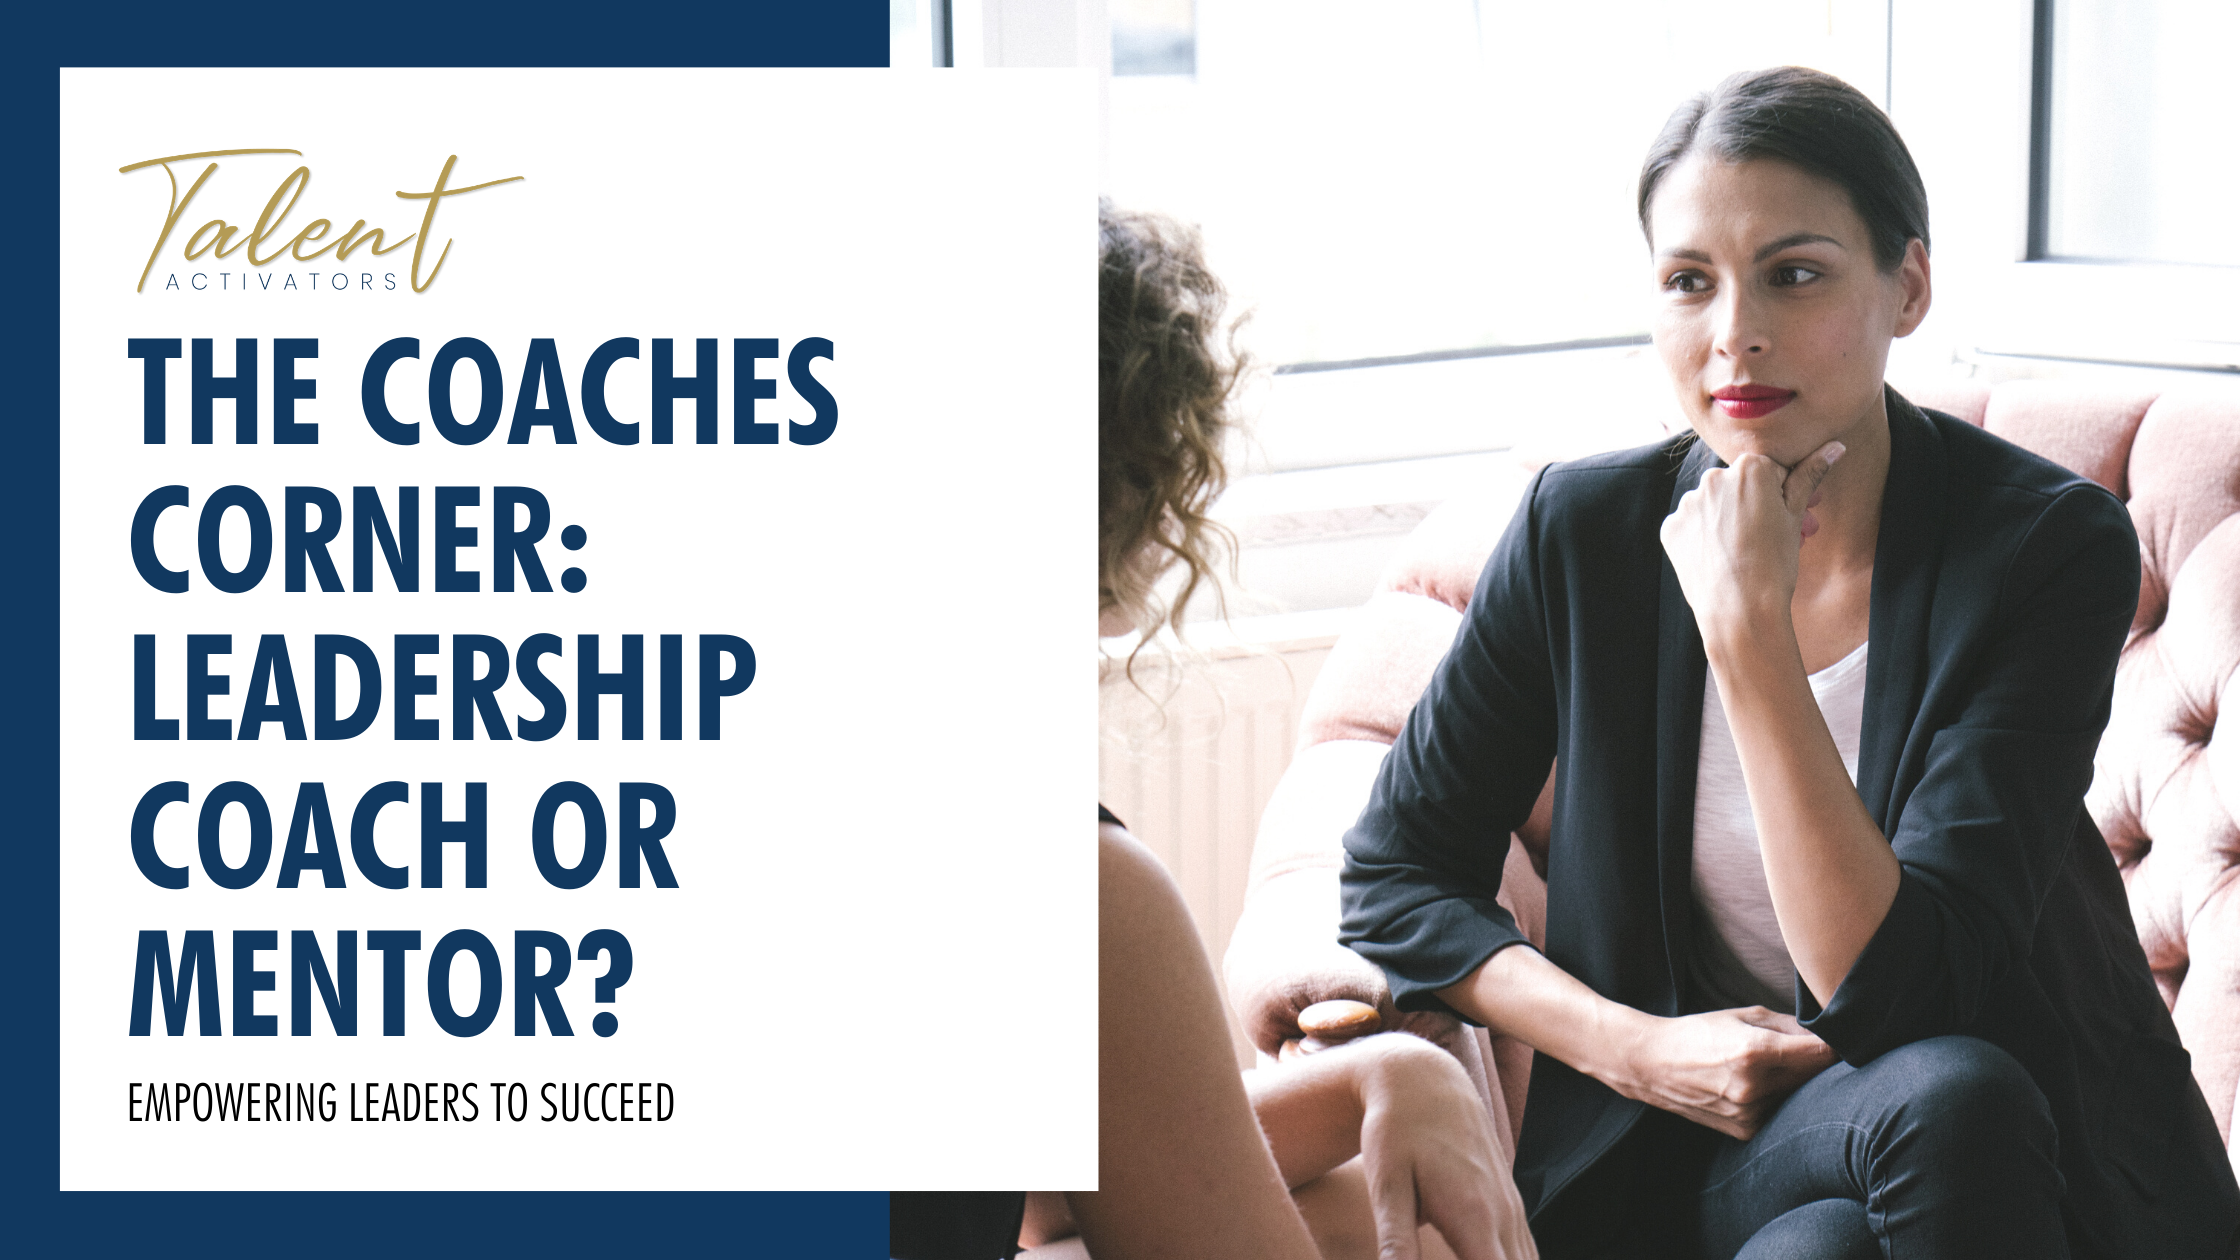 Leadership Coach